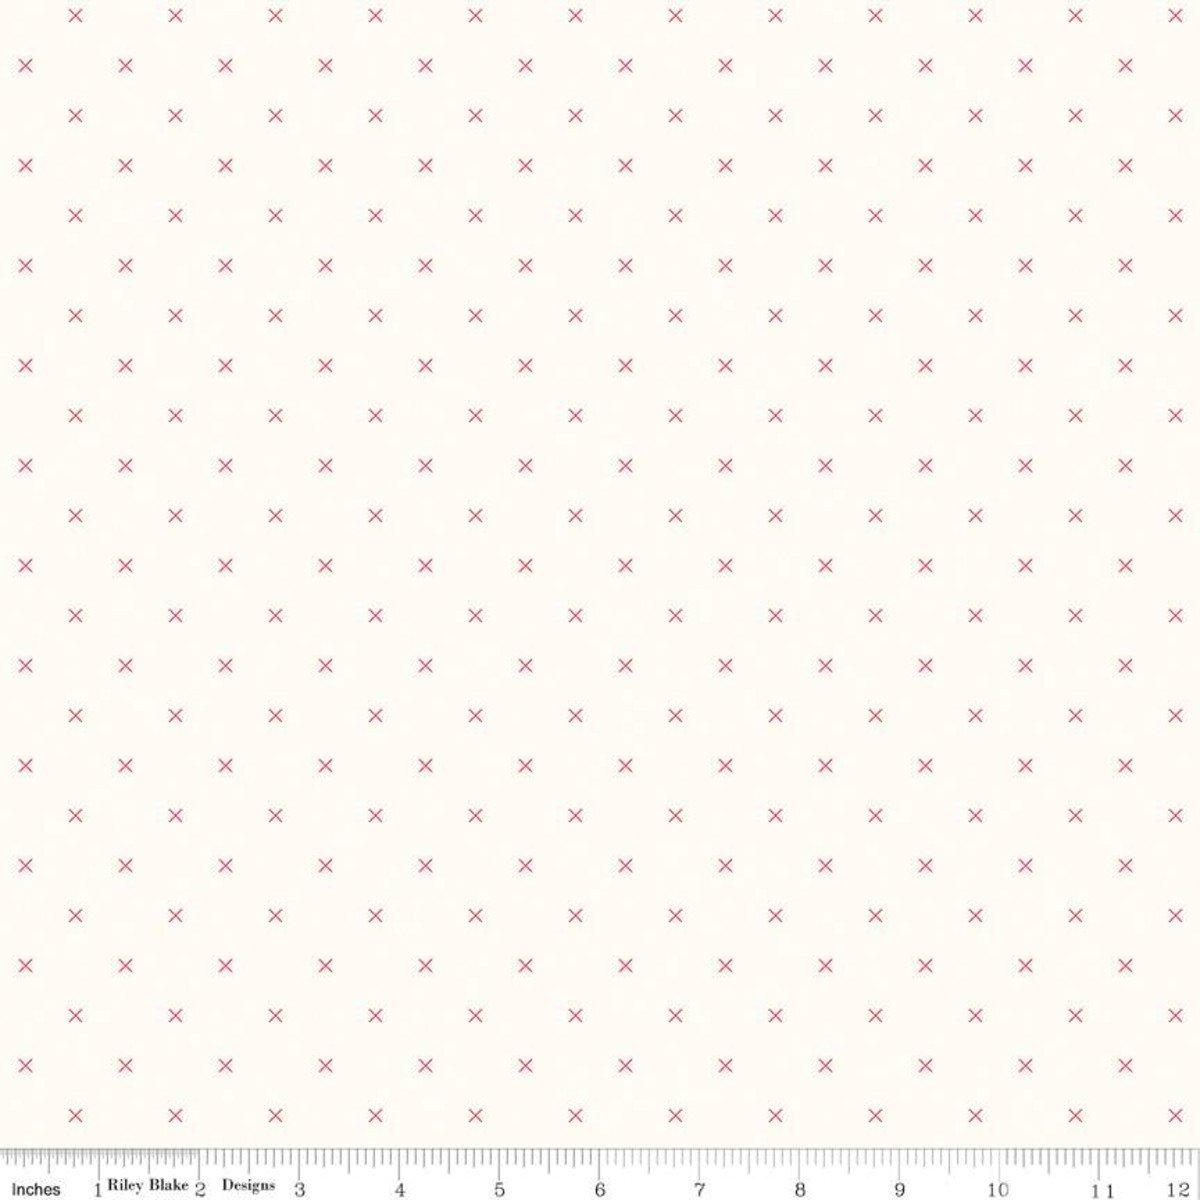 Cayenne - Cross Stitch - Bee Backgrounds - C6381-CAYENNE